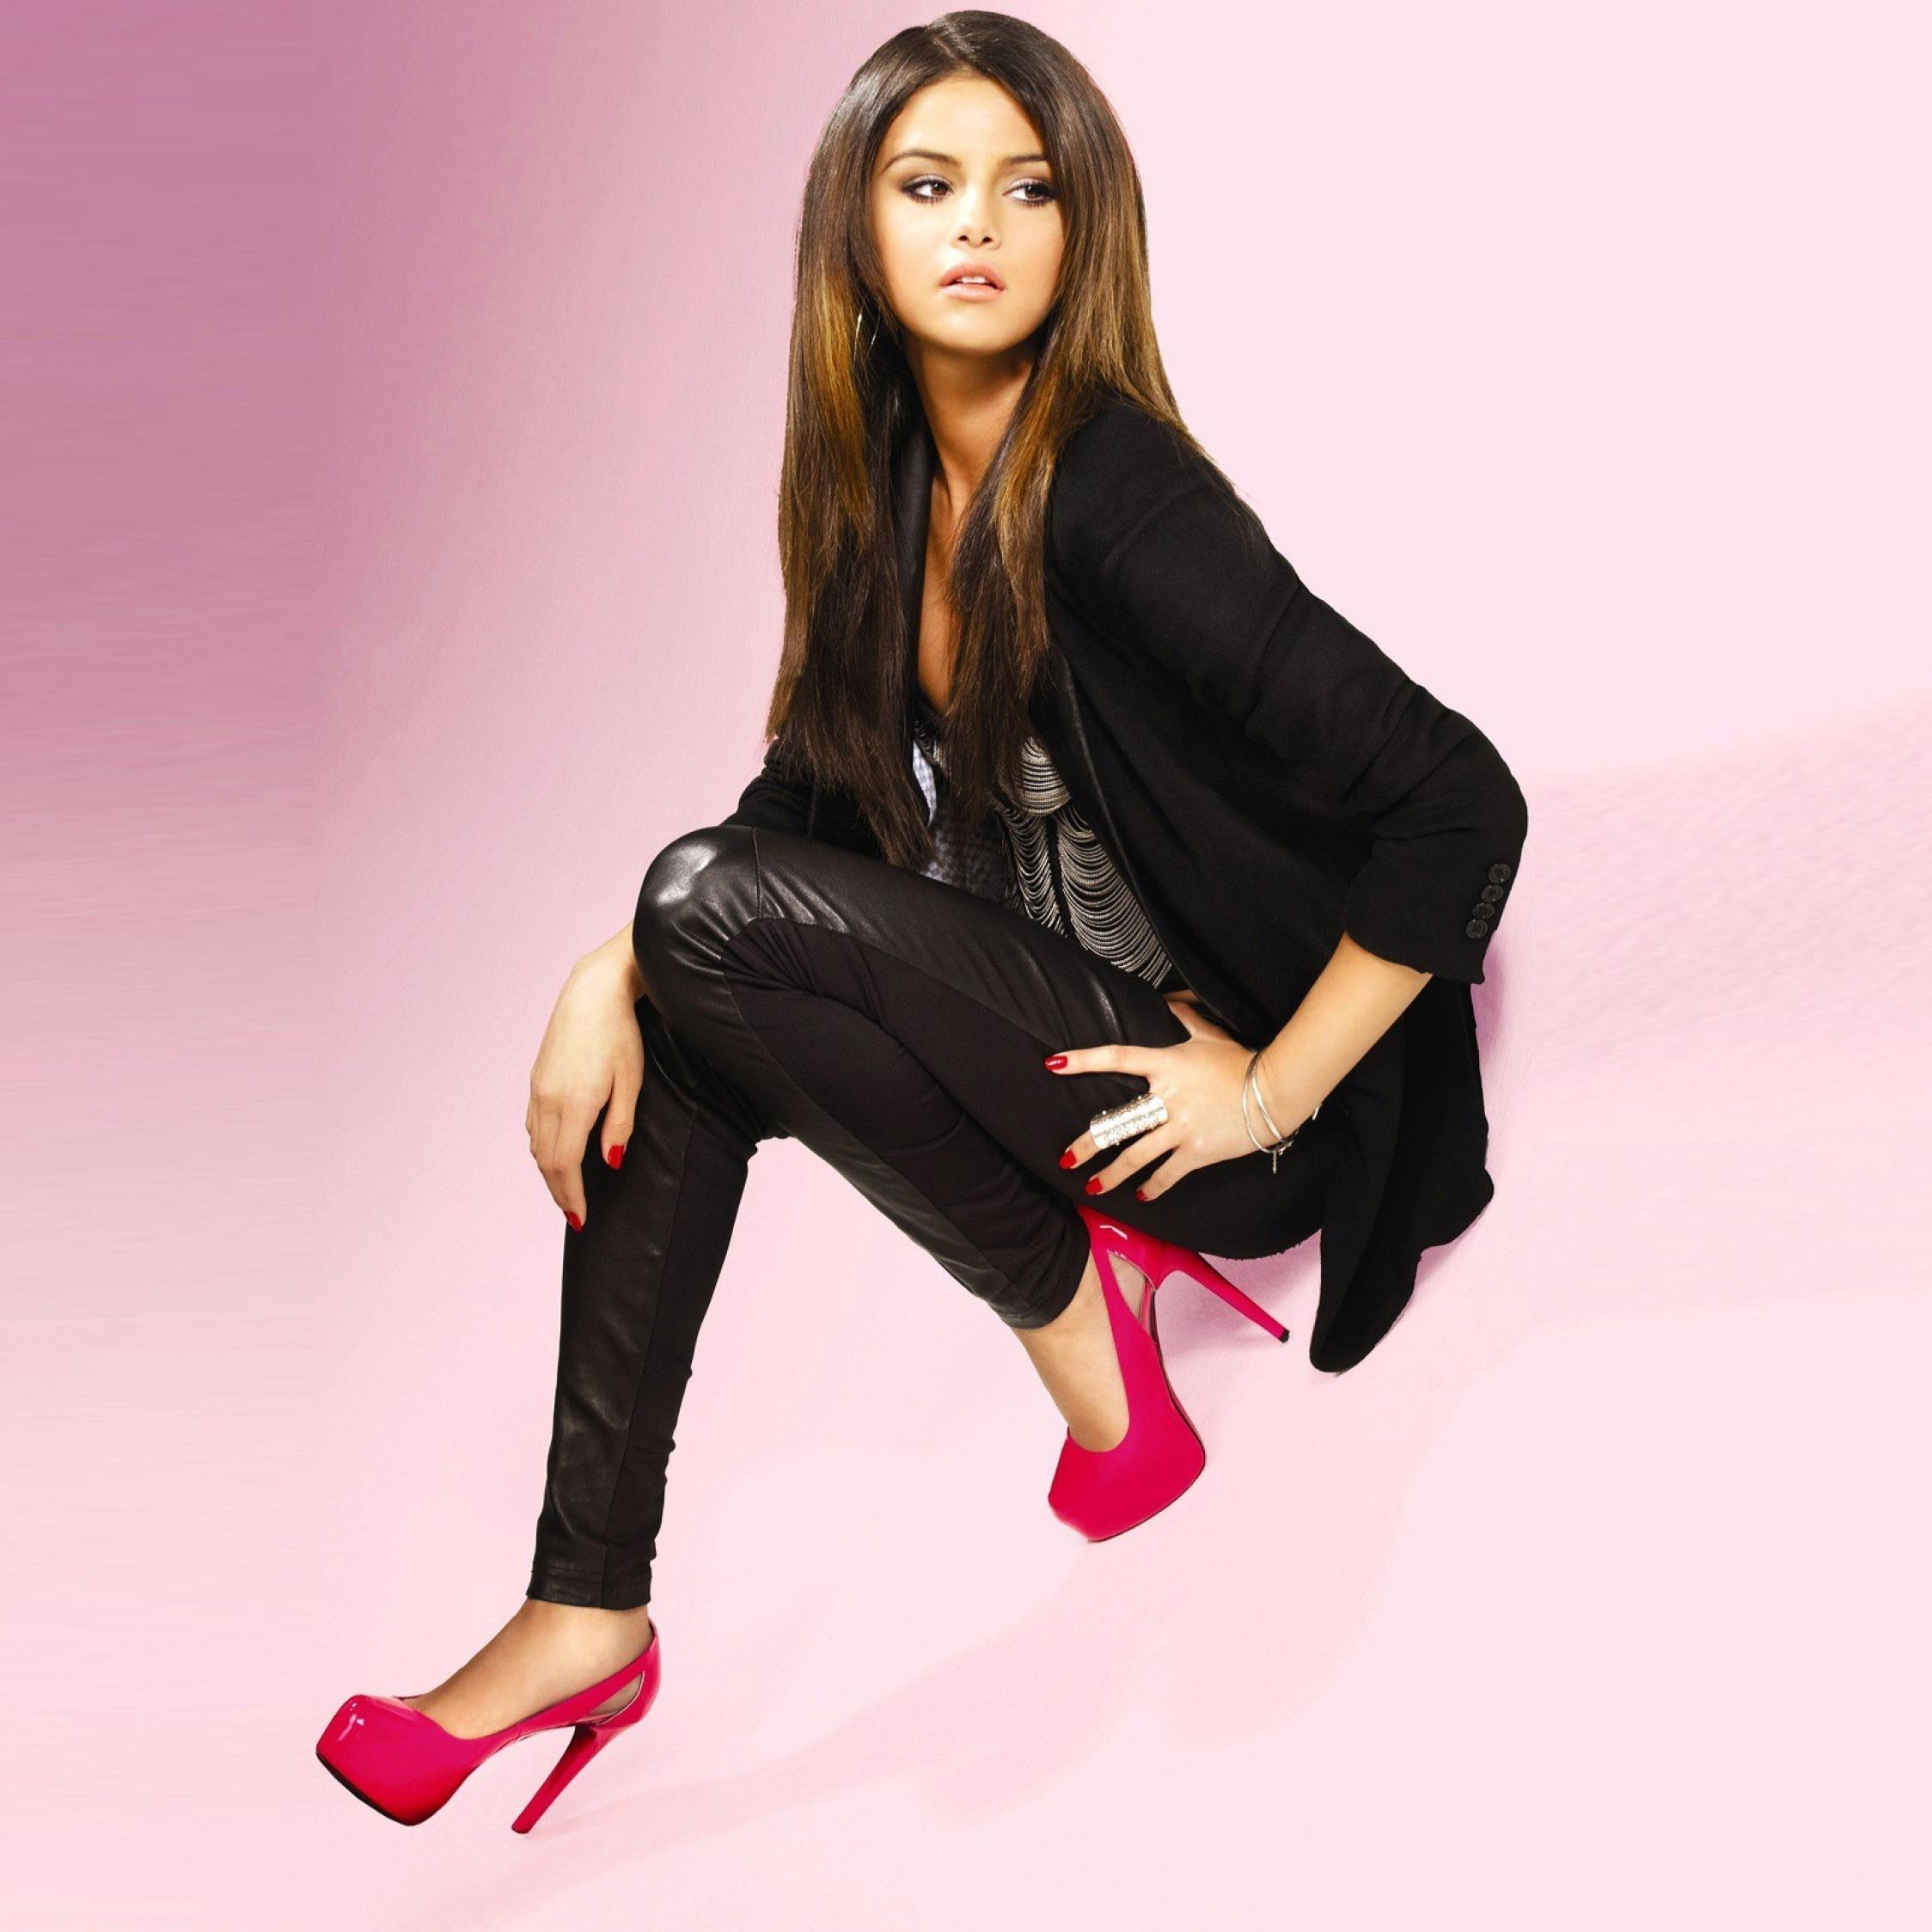 selena gomez high heels photoshoot full hd 2k wallpaper